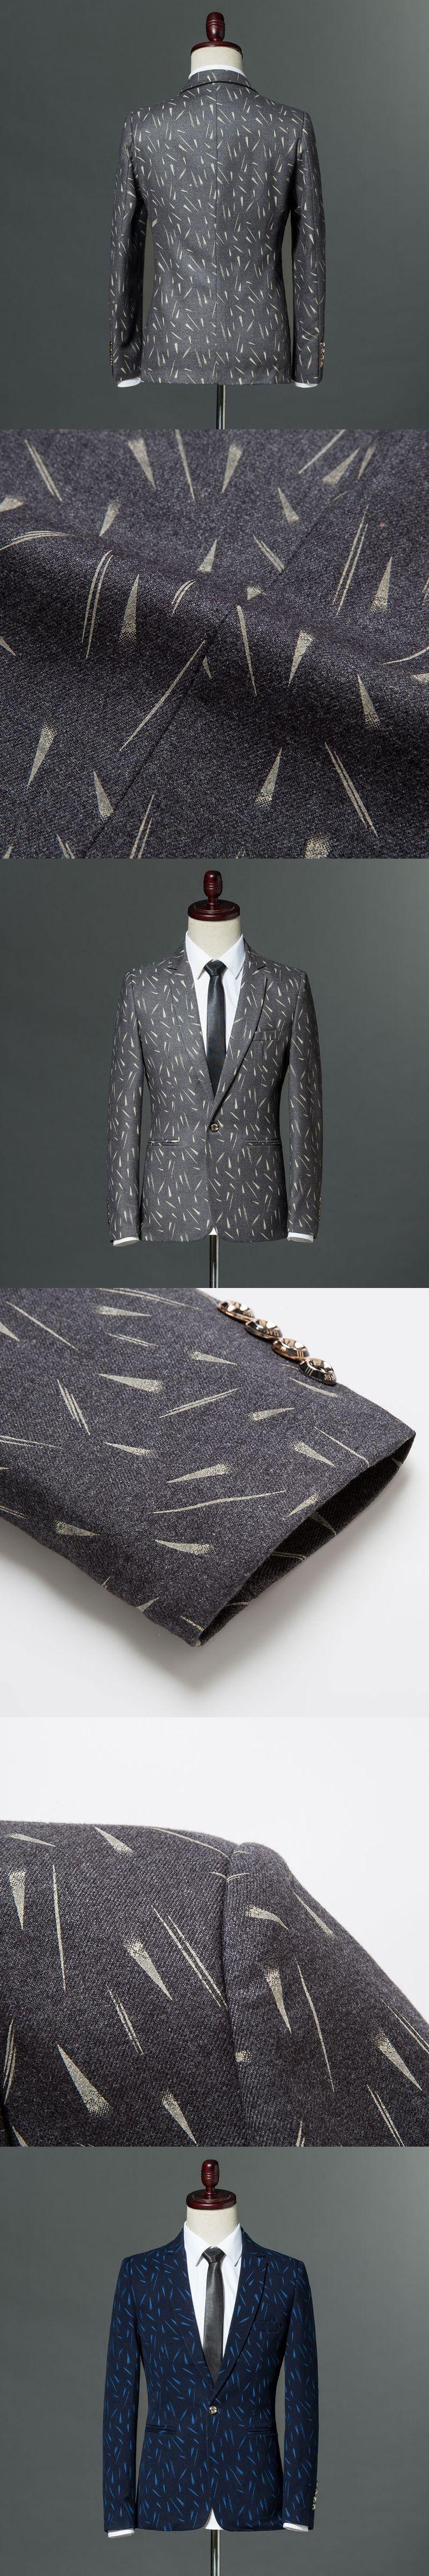 Navy Blue Dark grey Printed Fashion Blazer Masculino 2018 Brand Slim Fit Single Button Blazer Jackets S-2XL Wedding Party Jacket